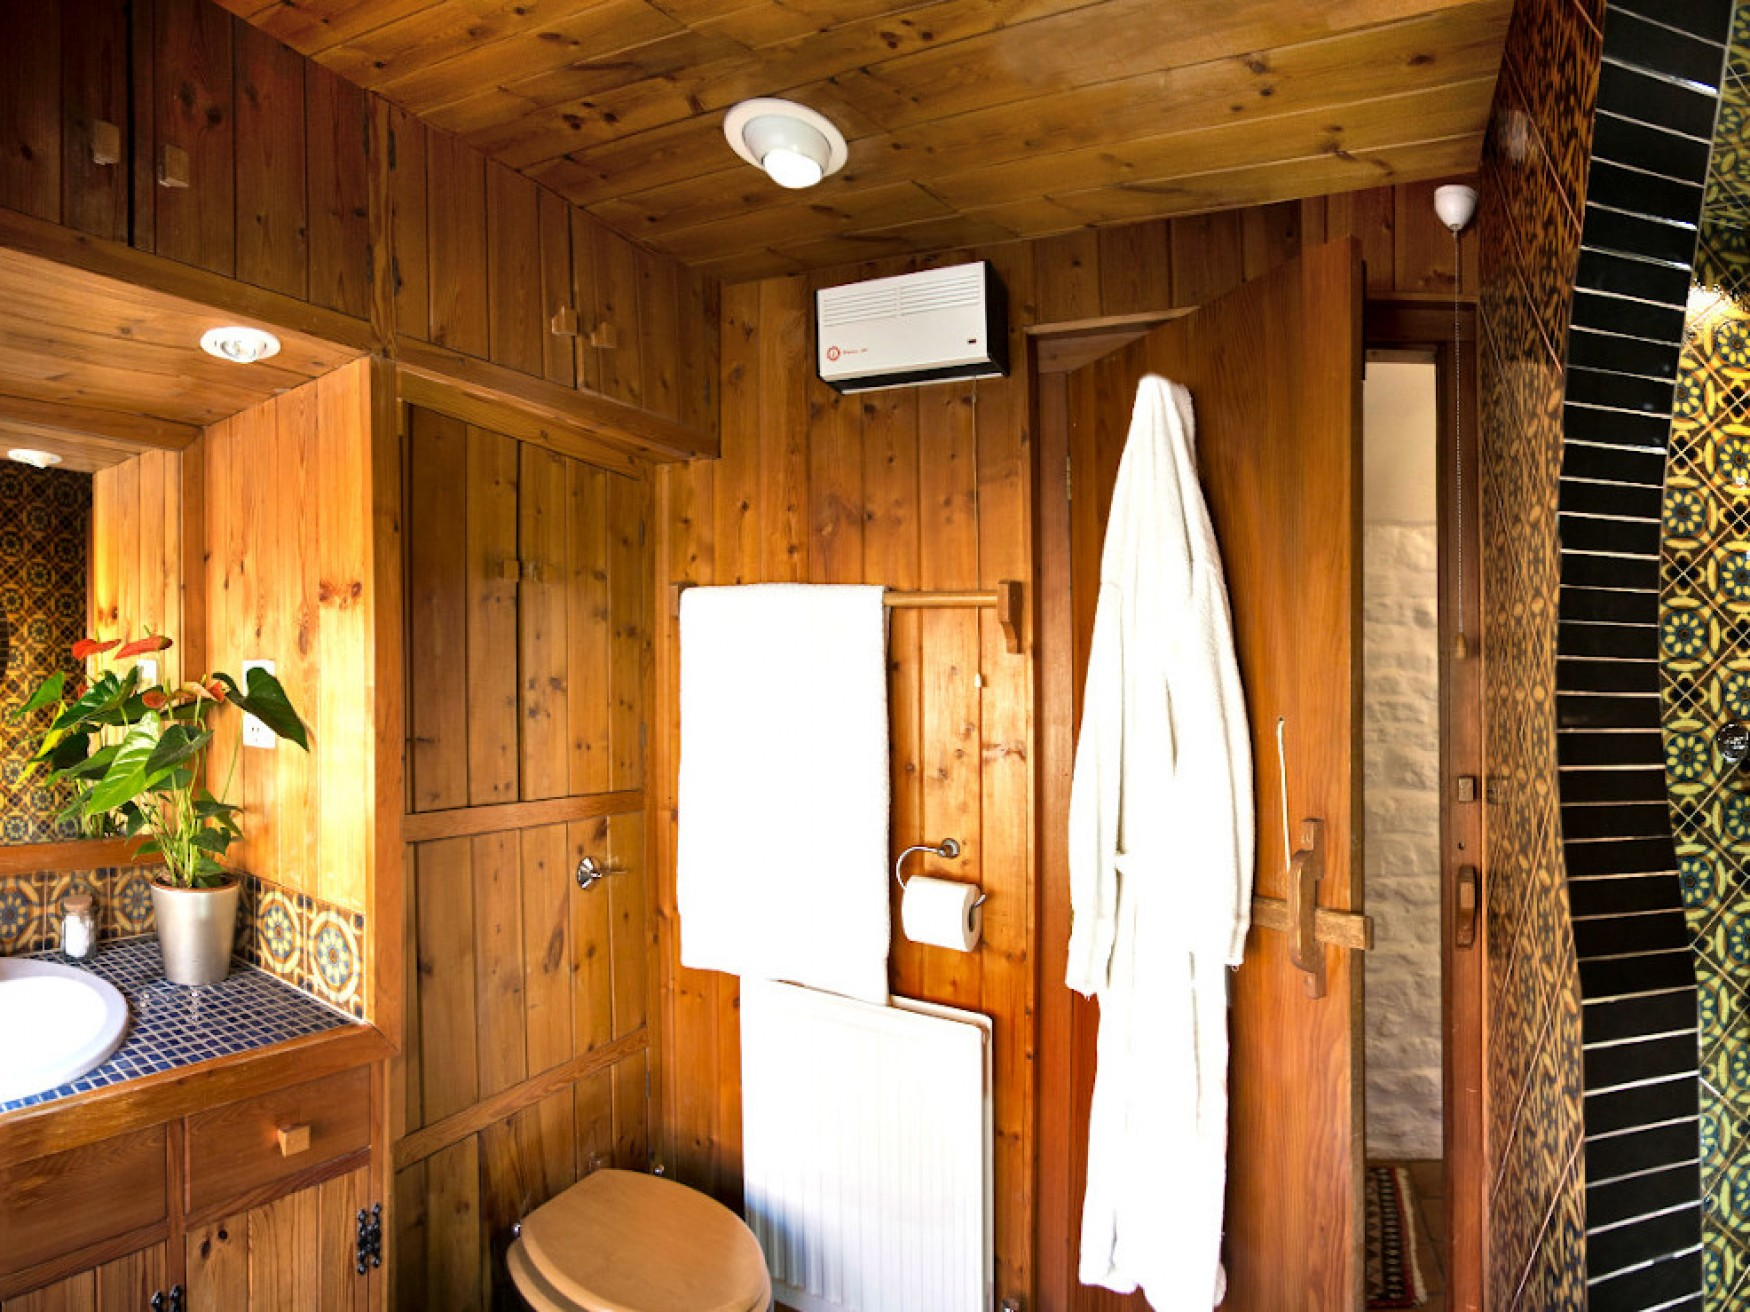 Beechnut Bathroom overview